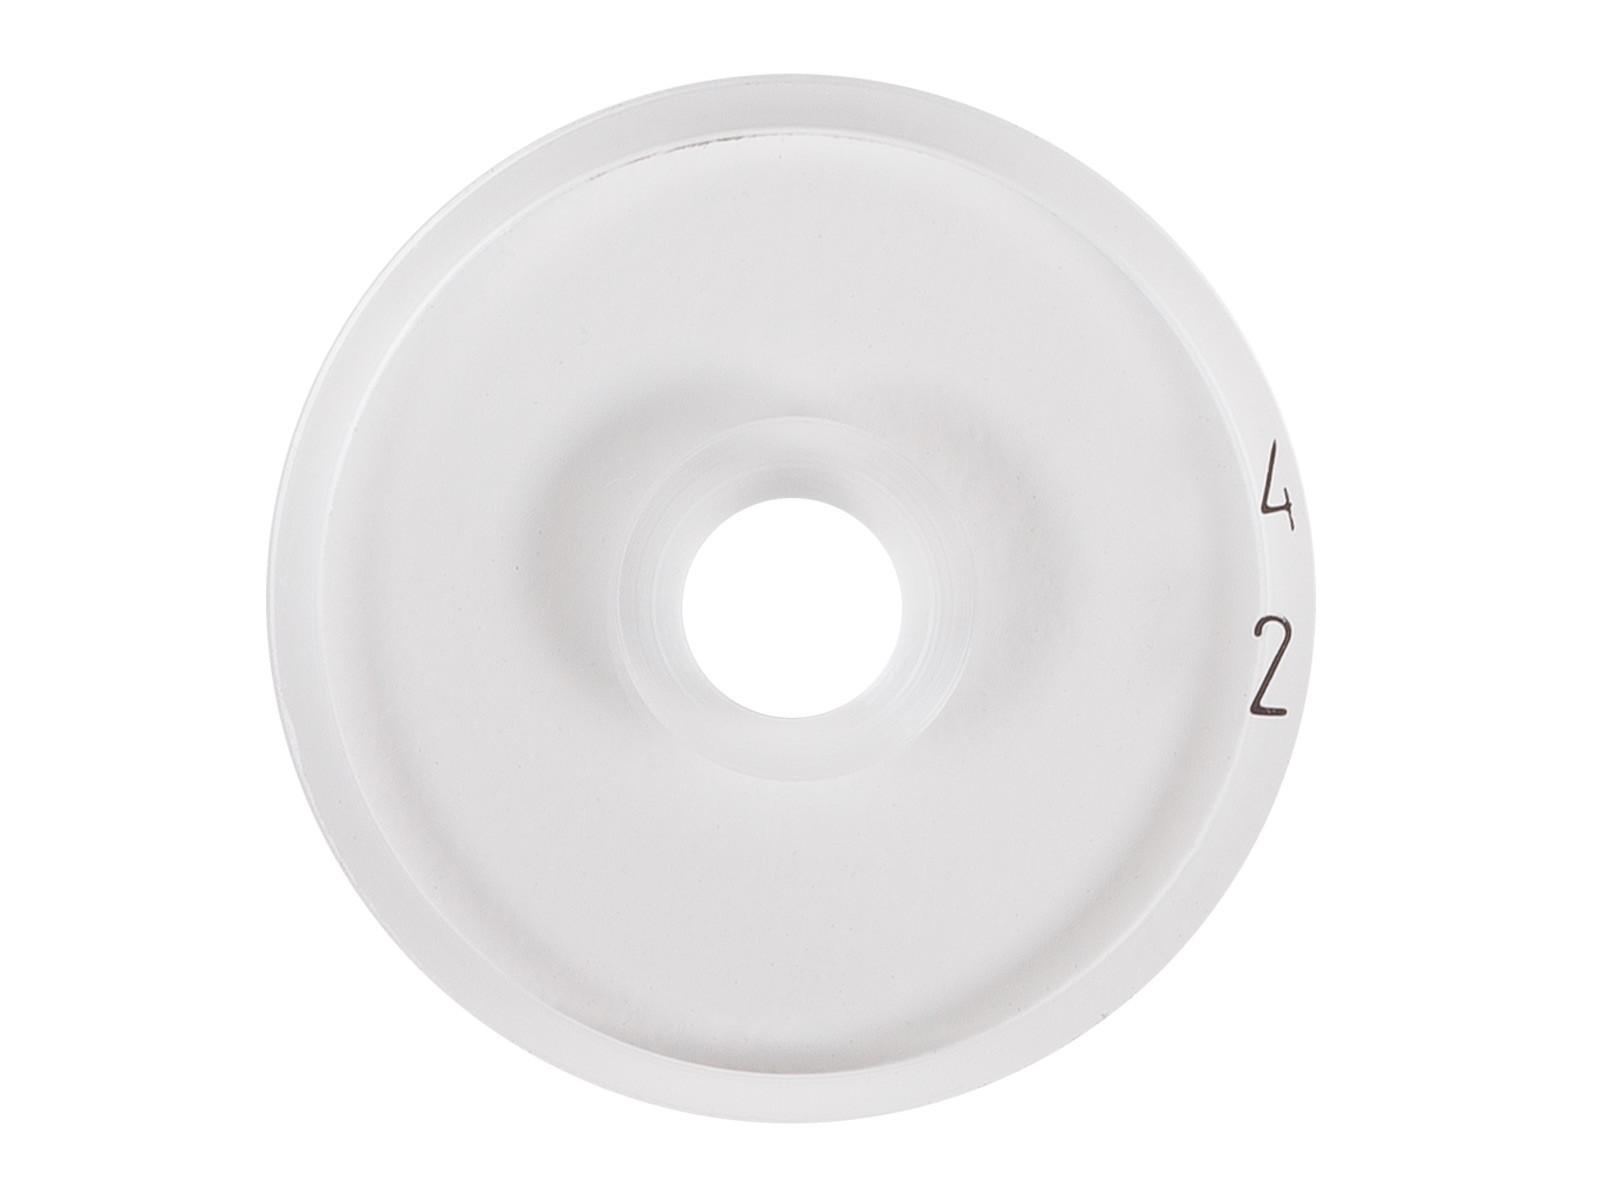 Feinwerkbau 22mm Clear.